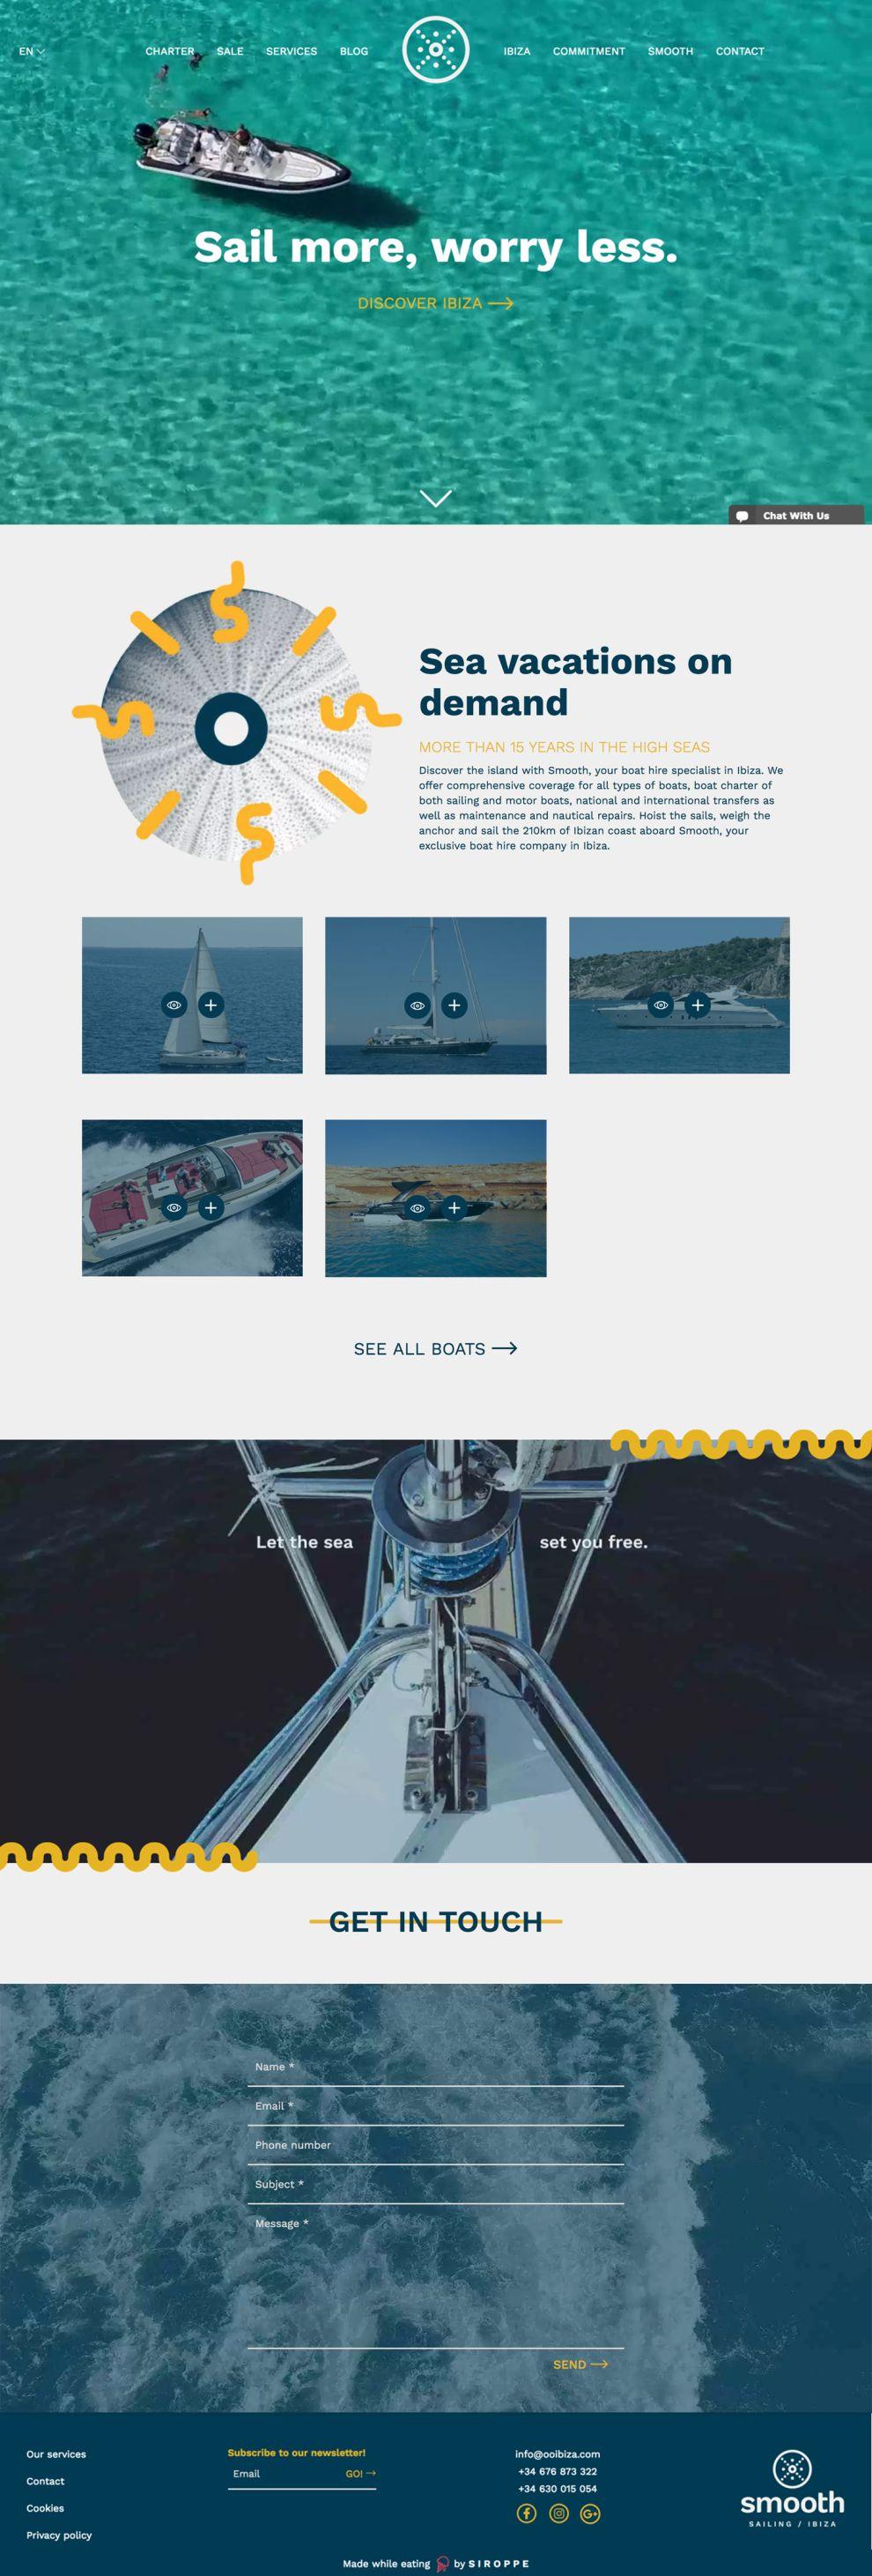 Smooth Sailing Ibiza Beautiful Homepage